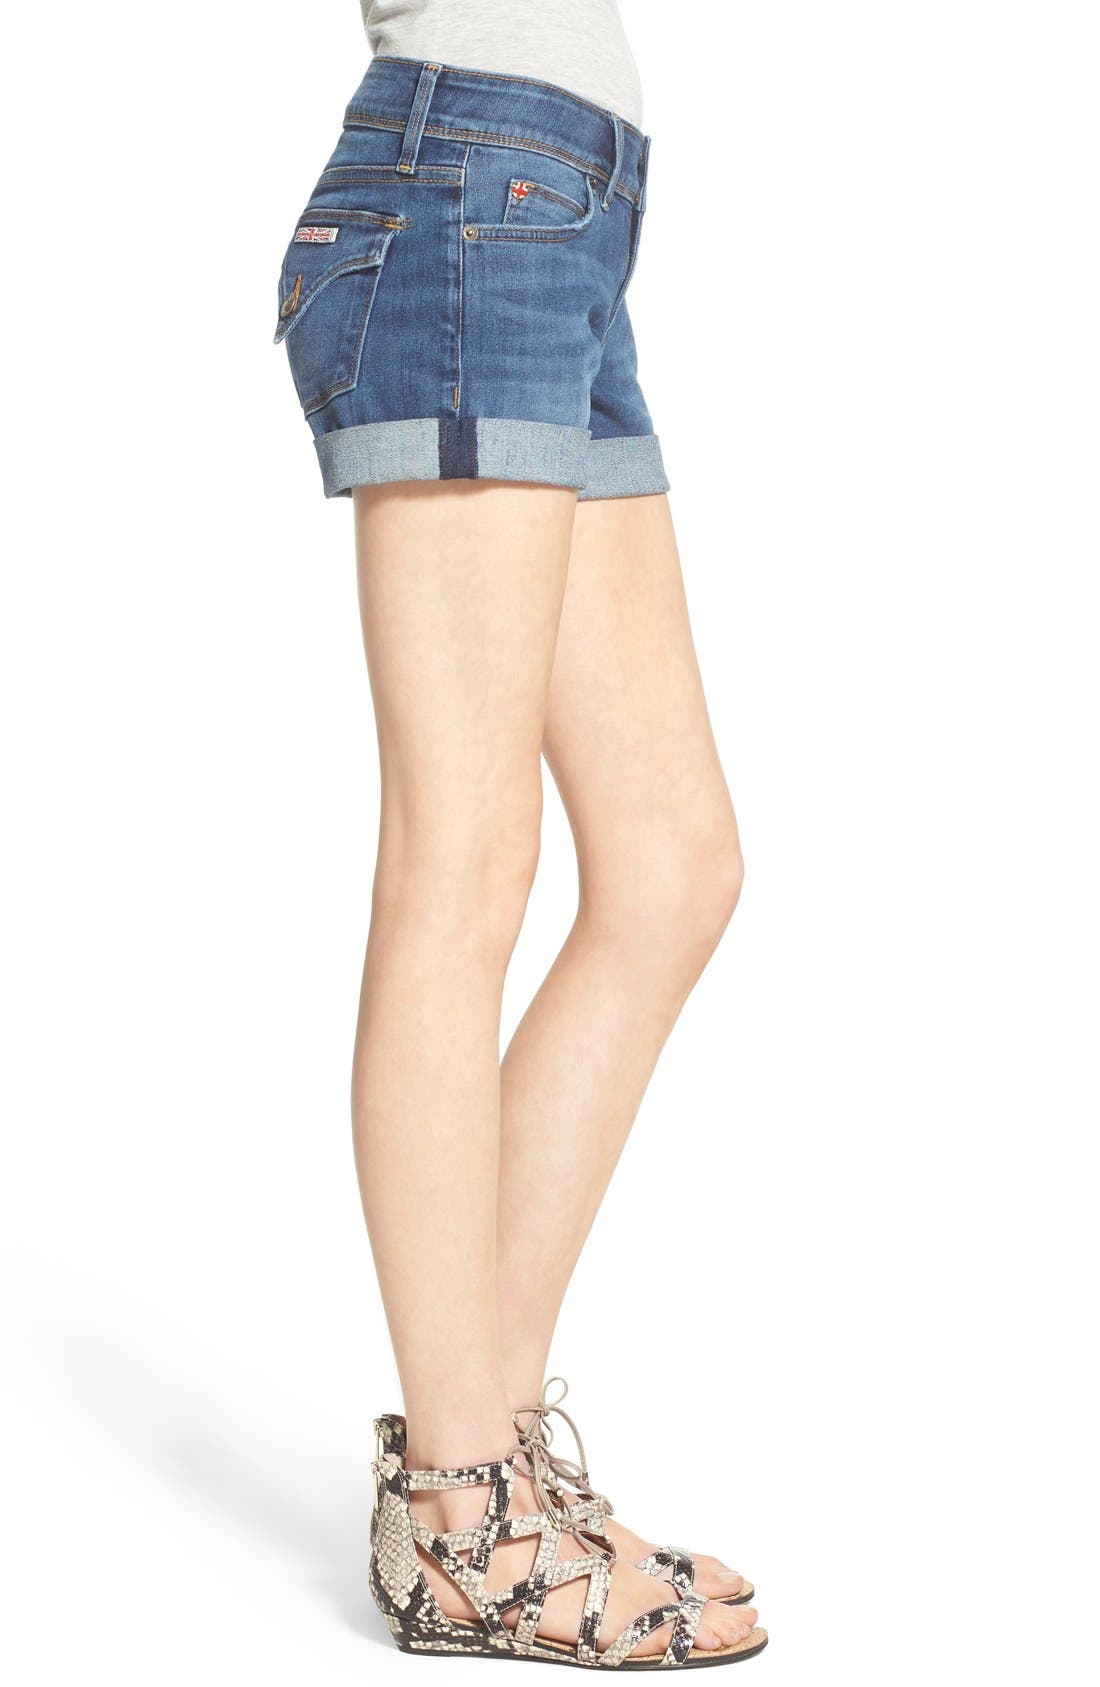 'Croxley' Cuffed Denim Shorts,                             Alternate thumbnail 3, color,                             Advantageous